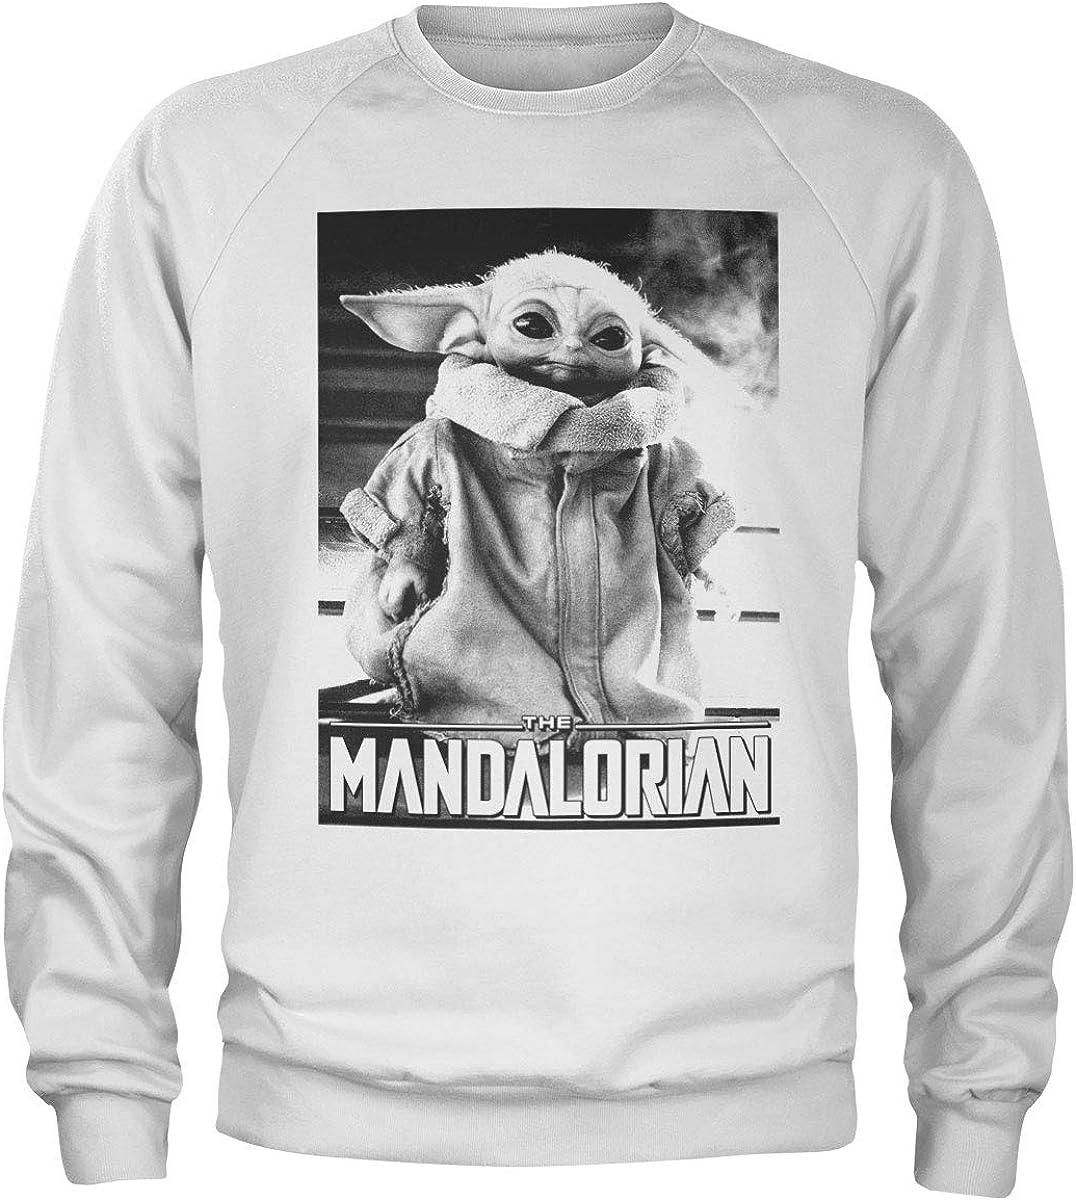 Officially Licensed Baby Yoda Photo Sweatshirt (White), S